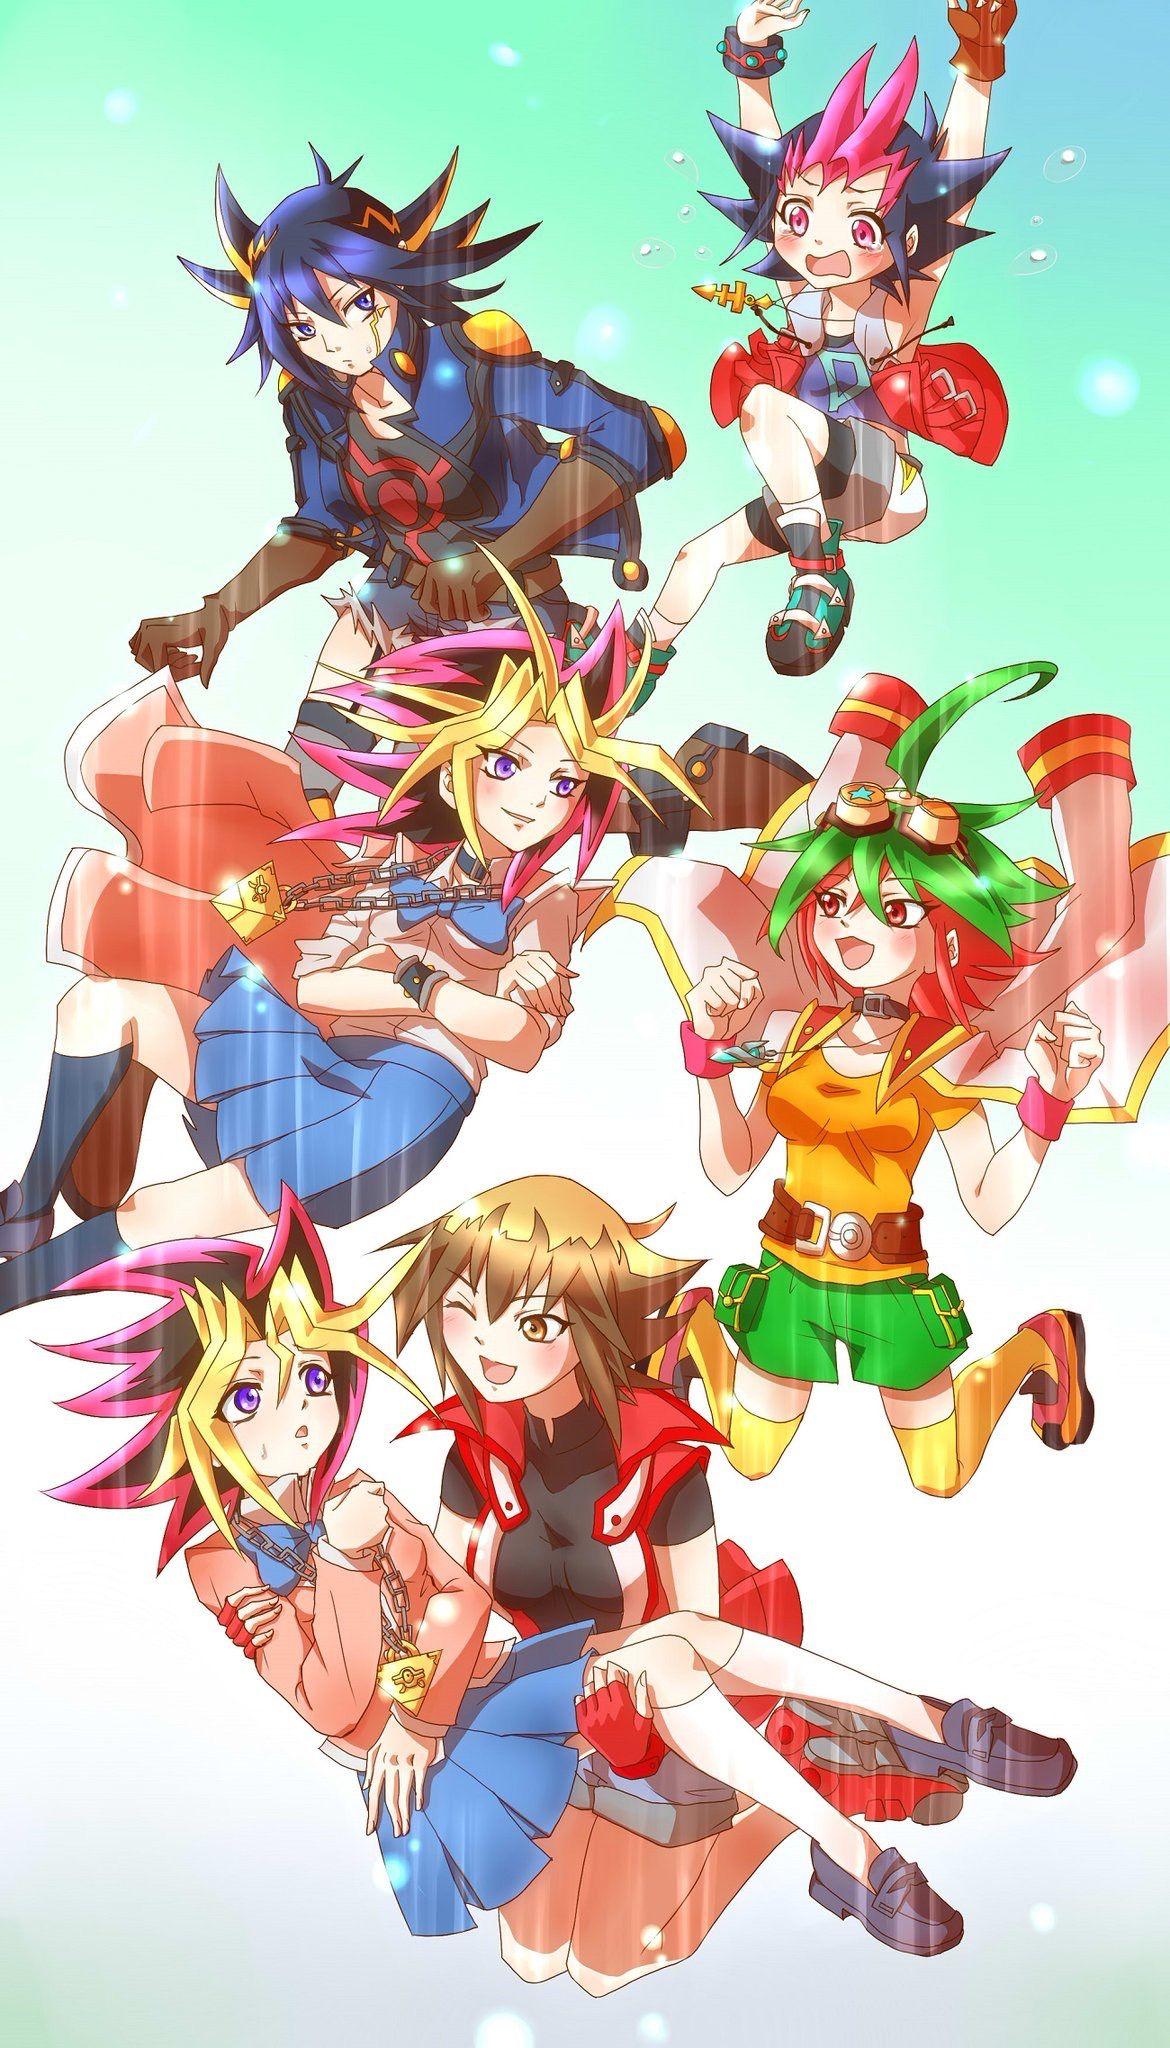 Pin By Hala Hadaya On Yu Gi Oh Gamers Anime Gender Bender Anime Yugioh Collection